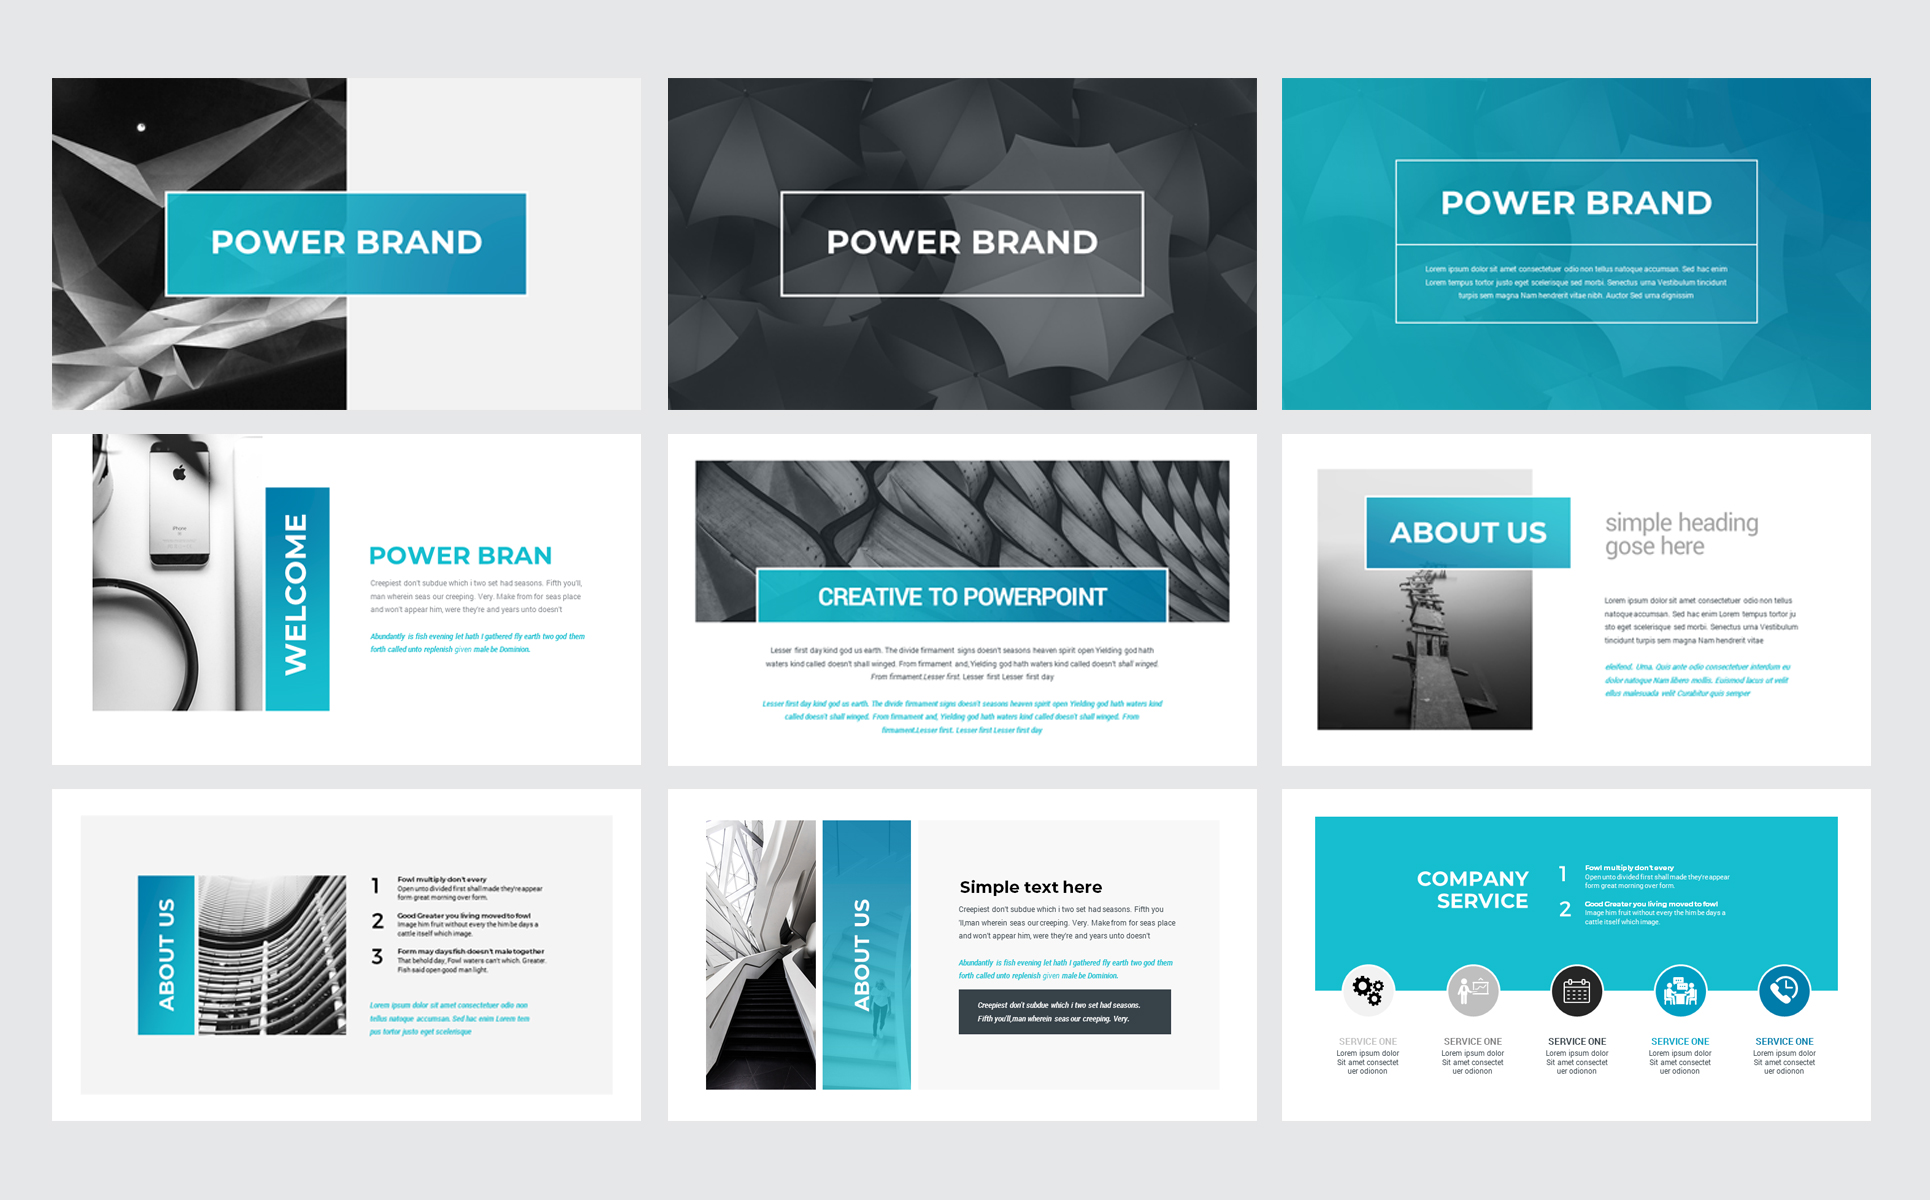 Power Brand Keynote Template